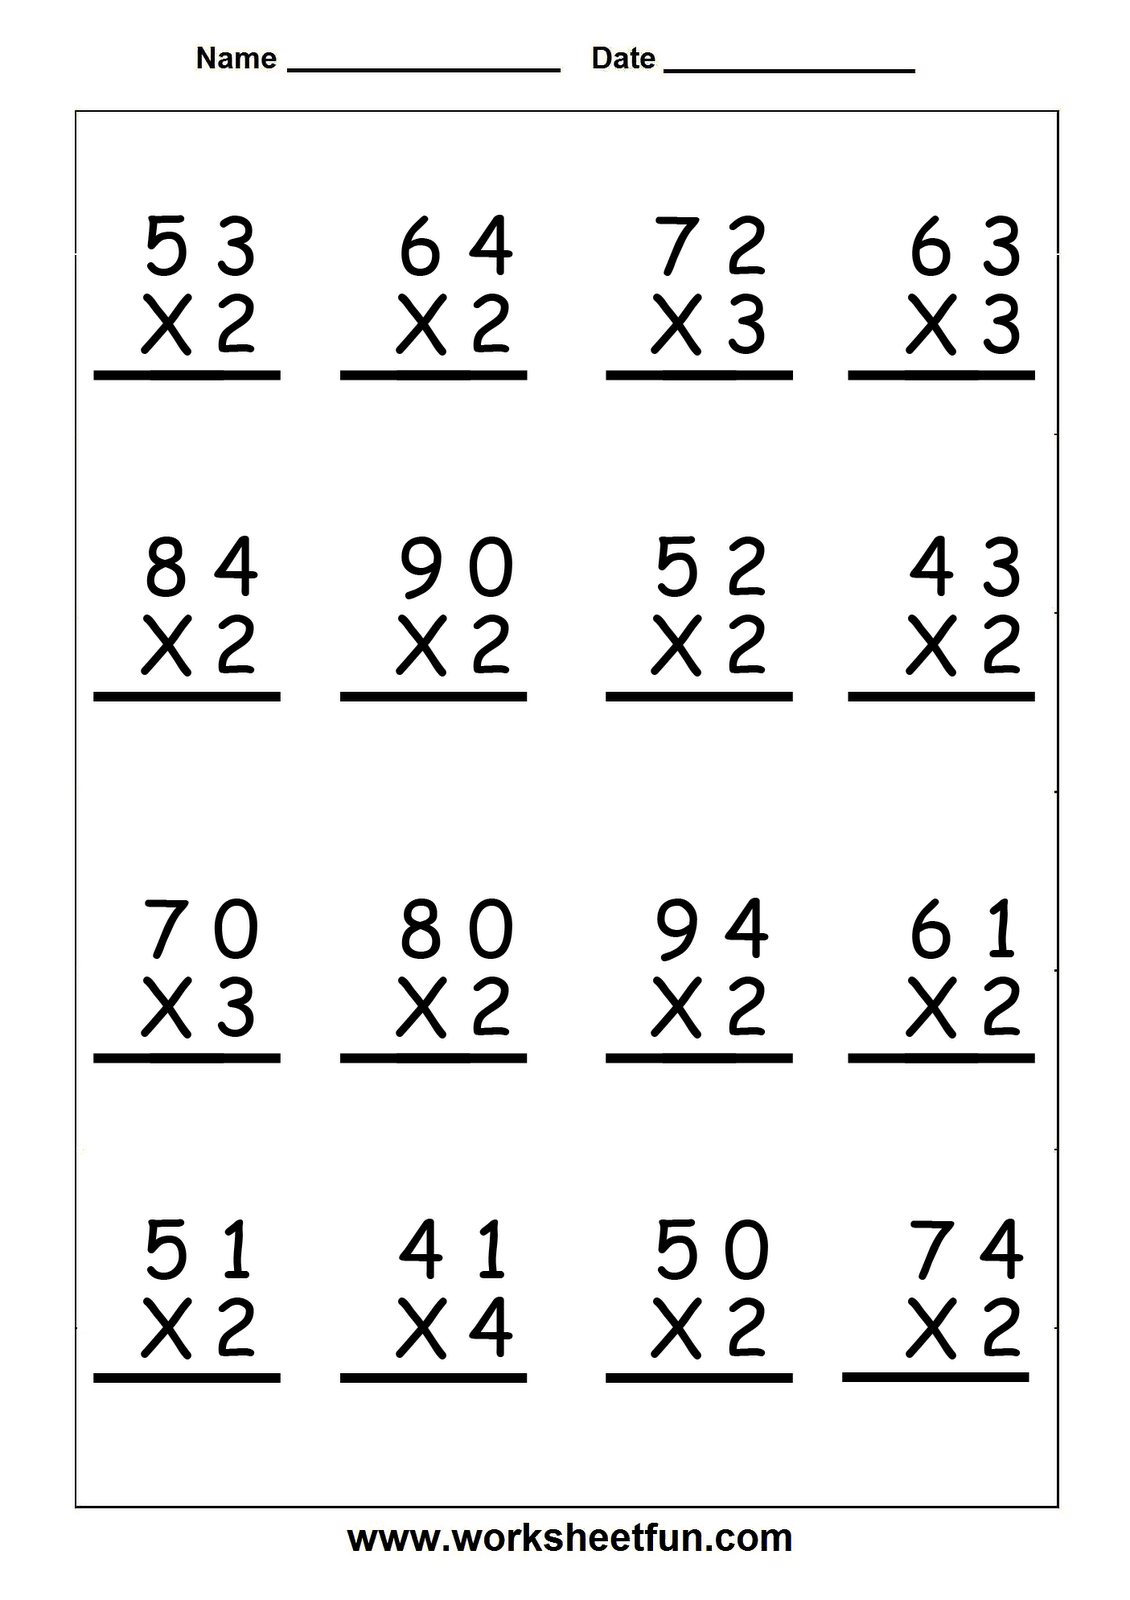 medium resolution of https://dubaikhalifas.com/1st-grade-measurement-activities-5th-grade-multiplication-test-4th-grade-math-worksheets/